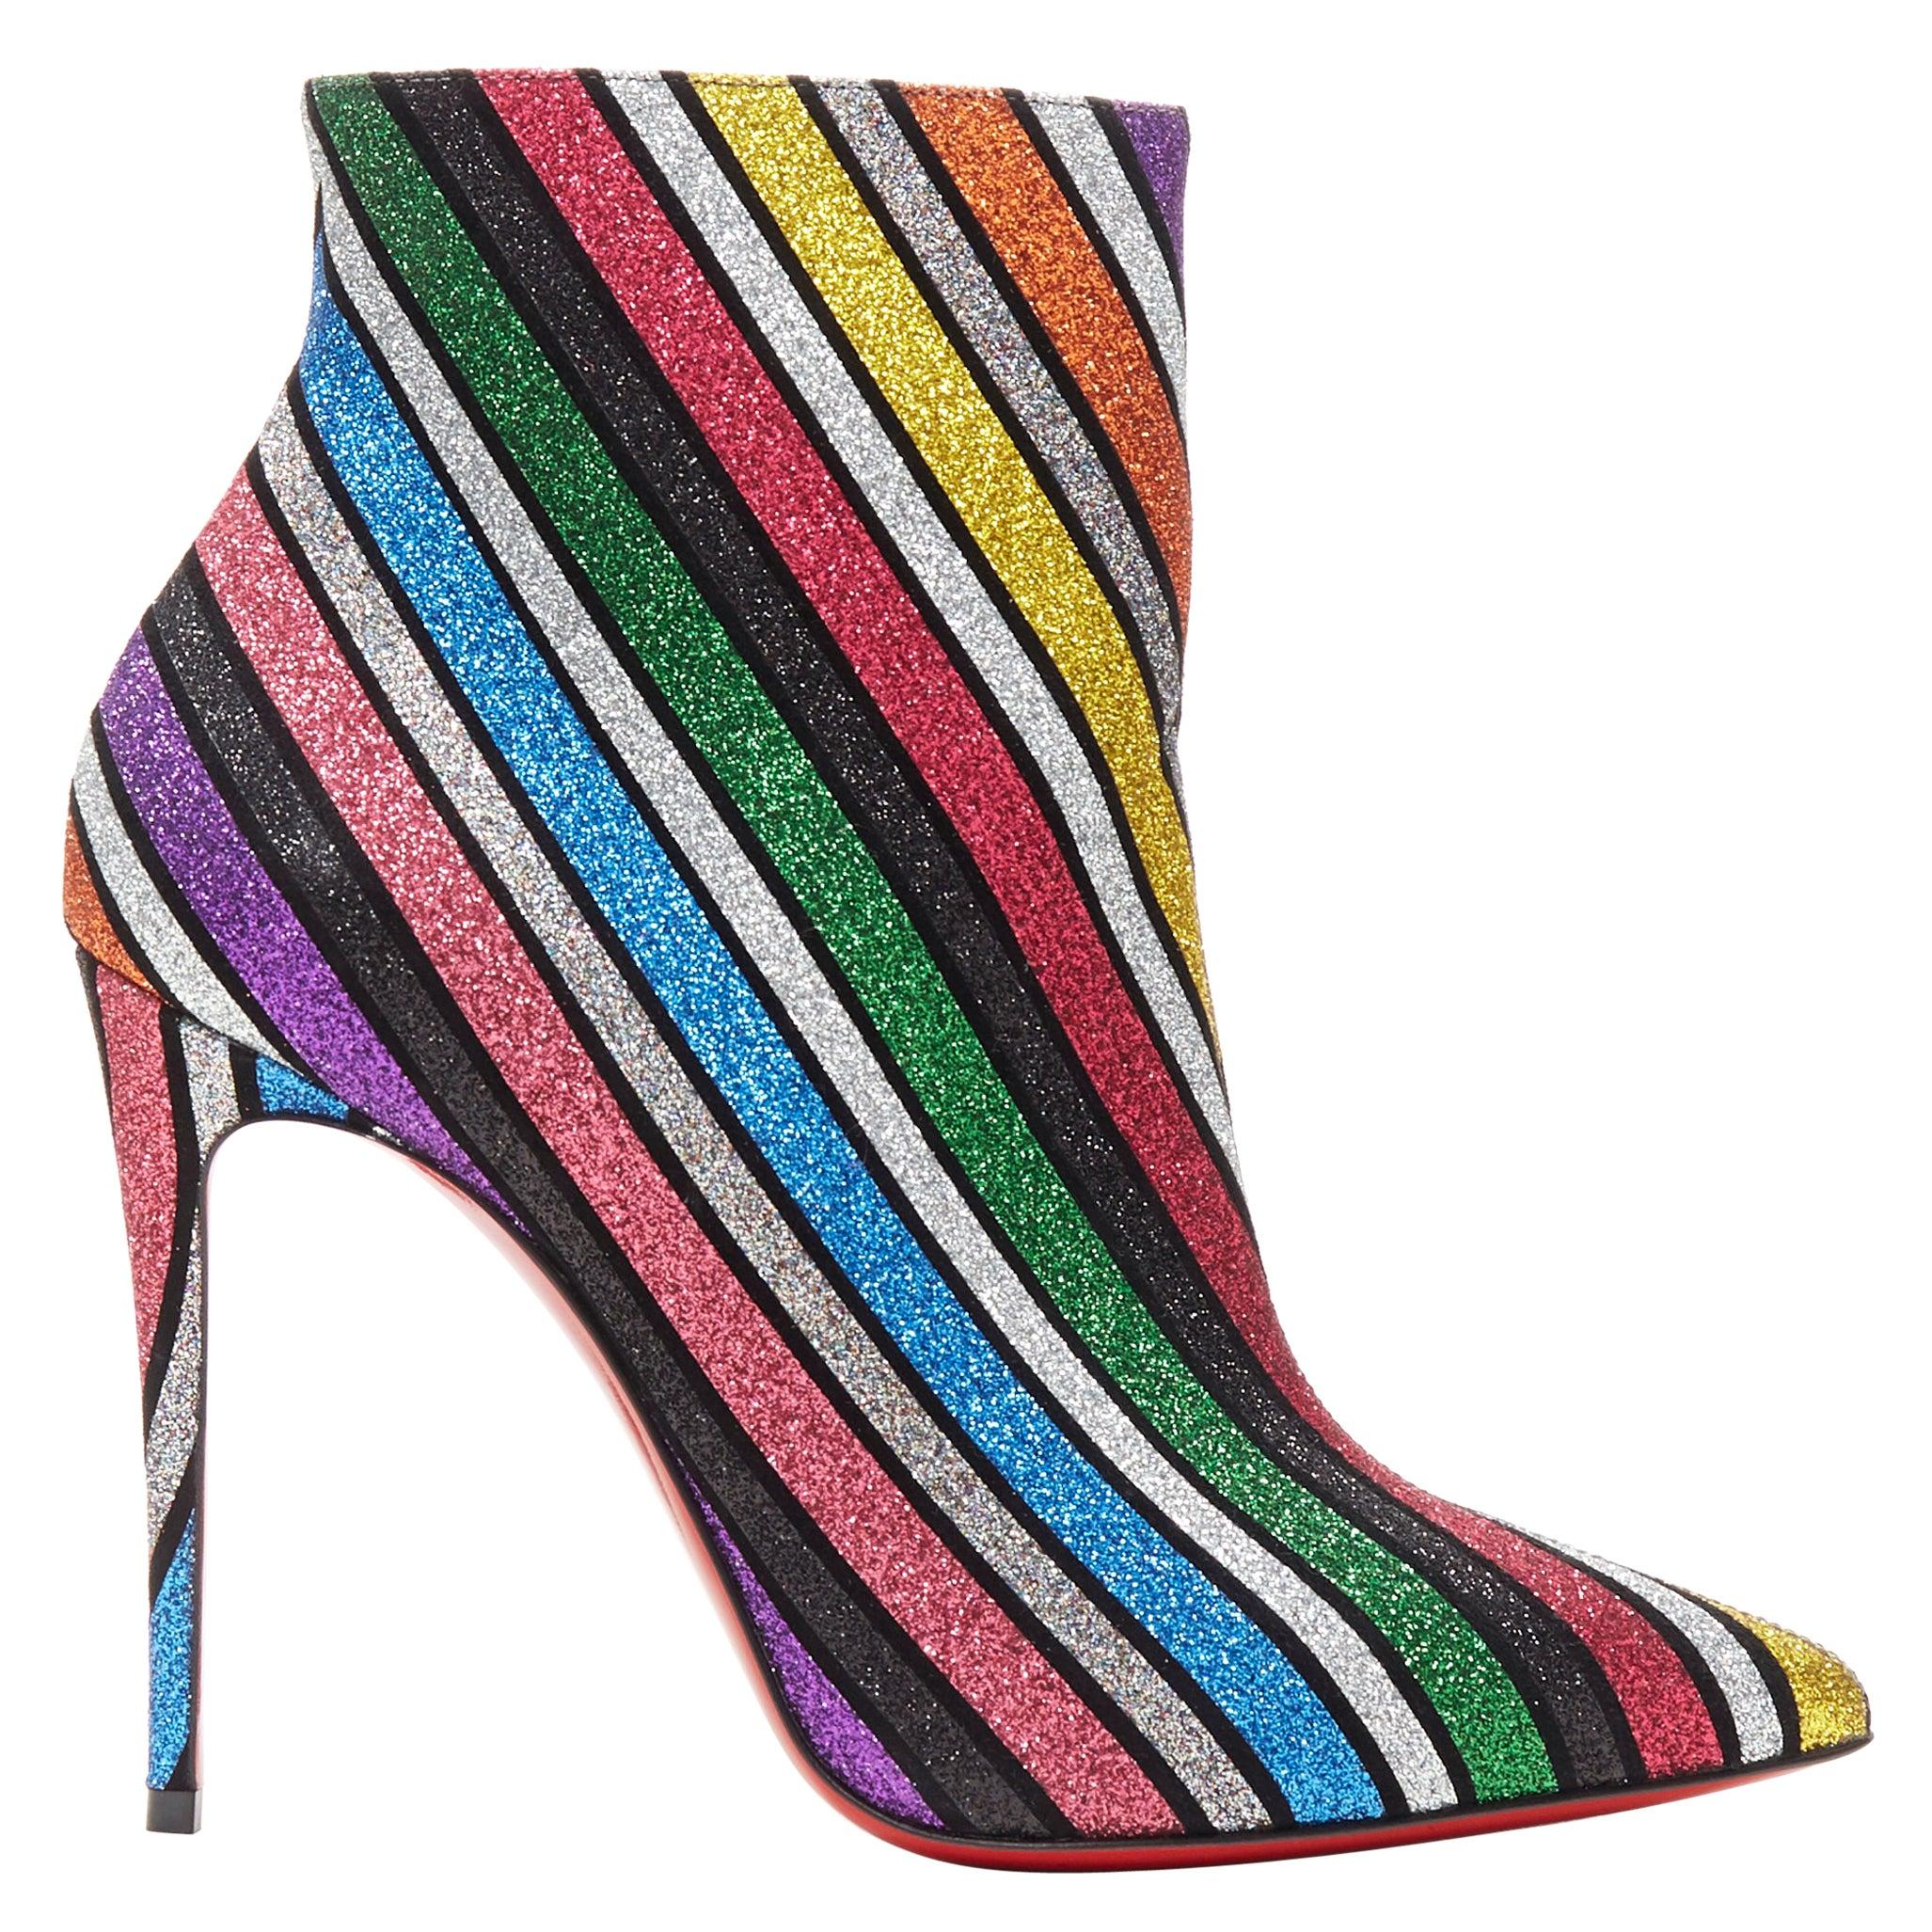 new CHRISTIAN LOUBOUTIN So Kate Booty 100 glitter multi stripe ankle boots EU36